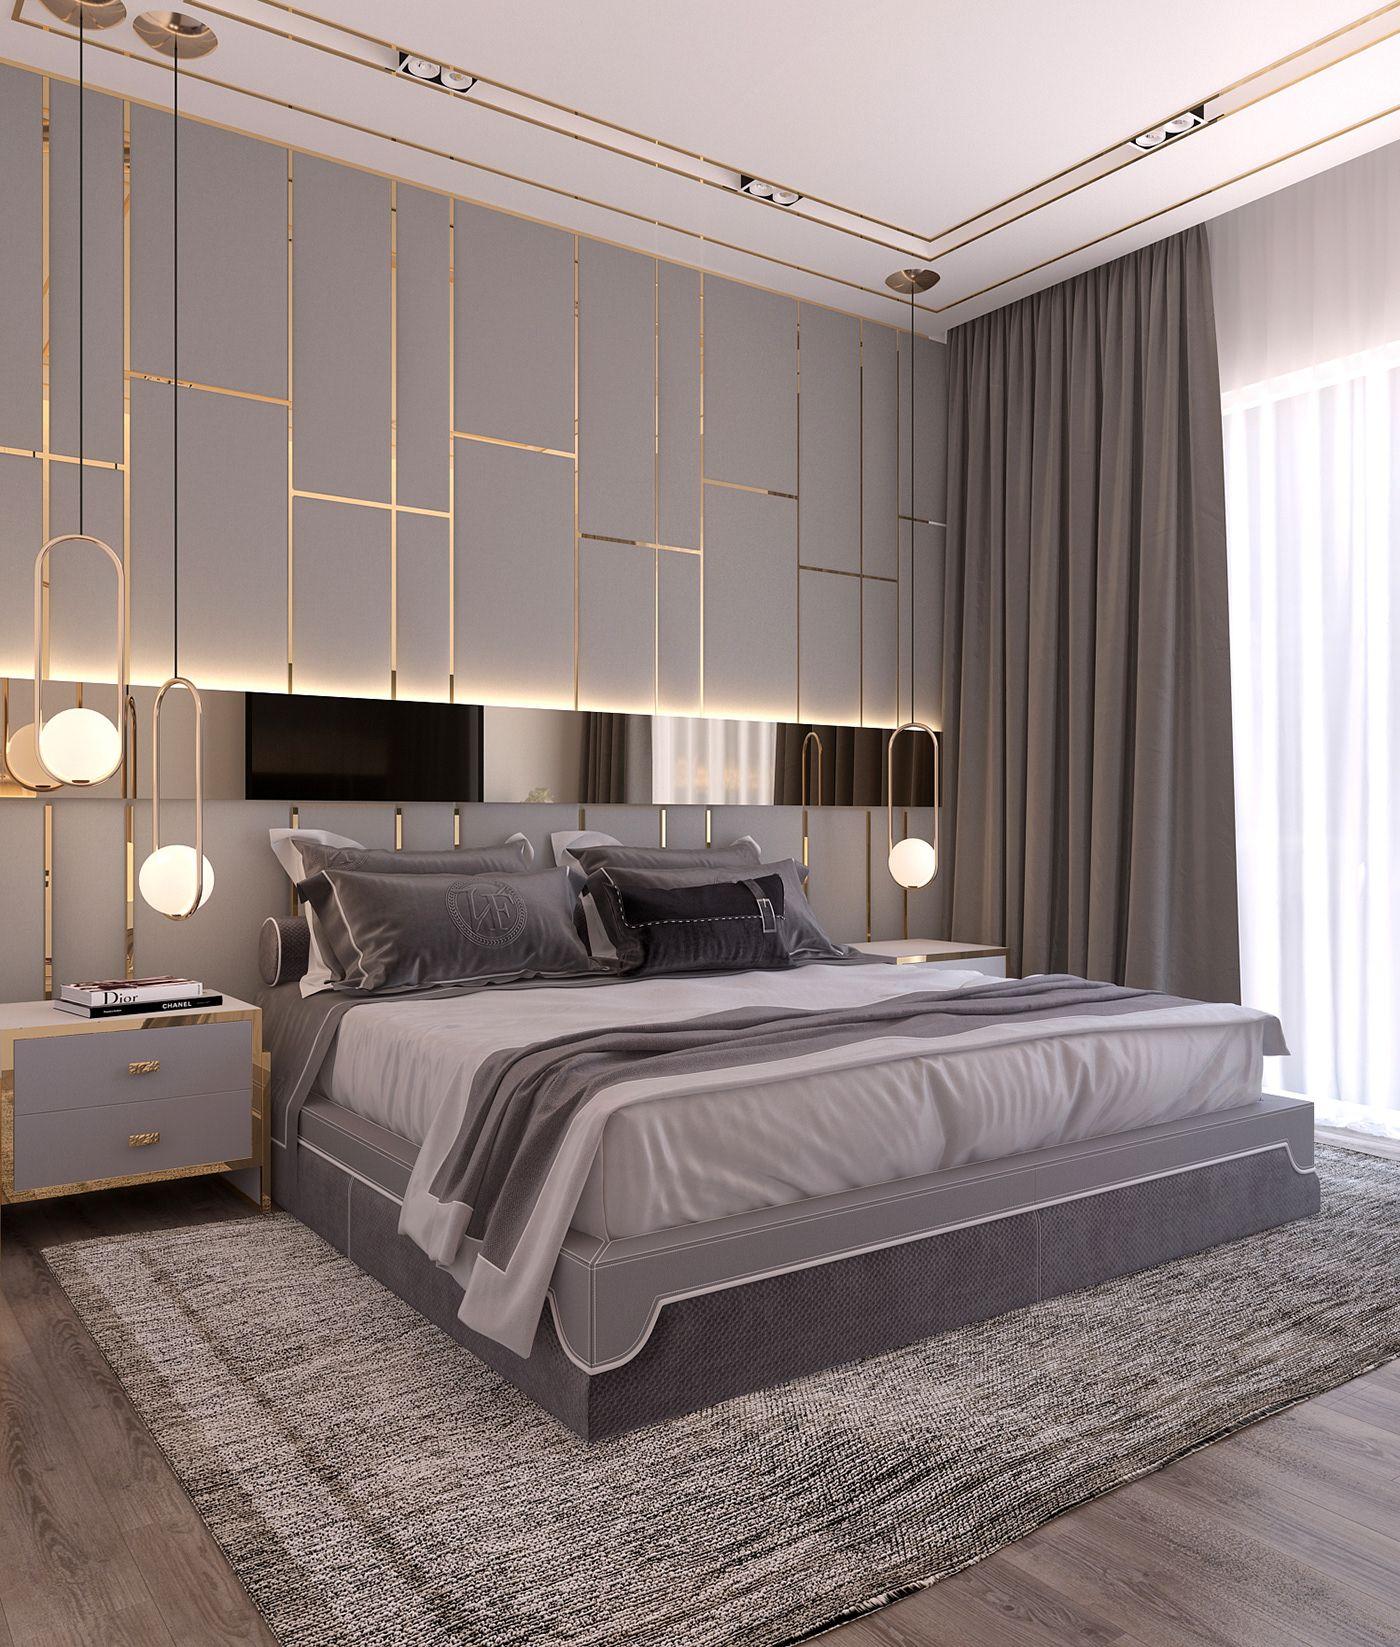 Modern Style Bedroom Dubai Project On Behance New House